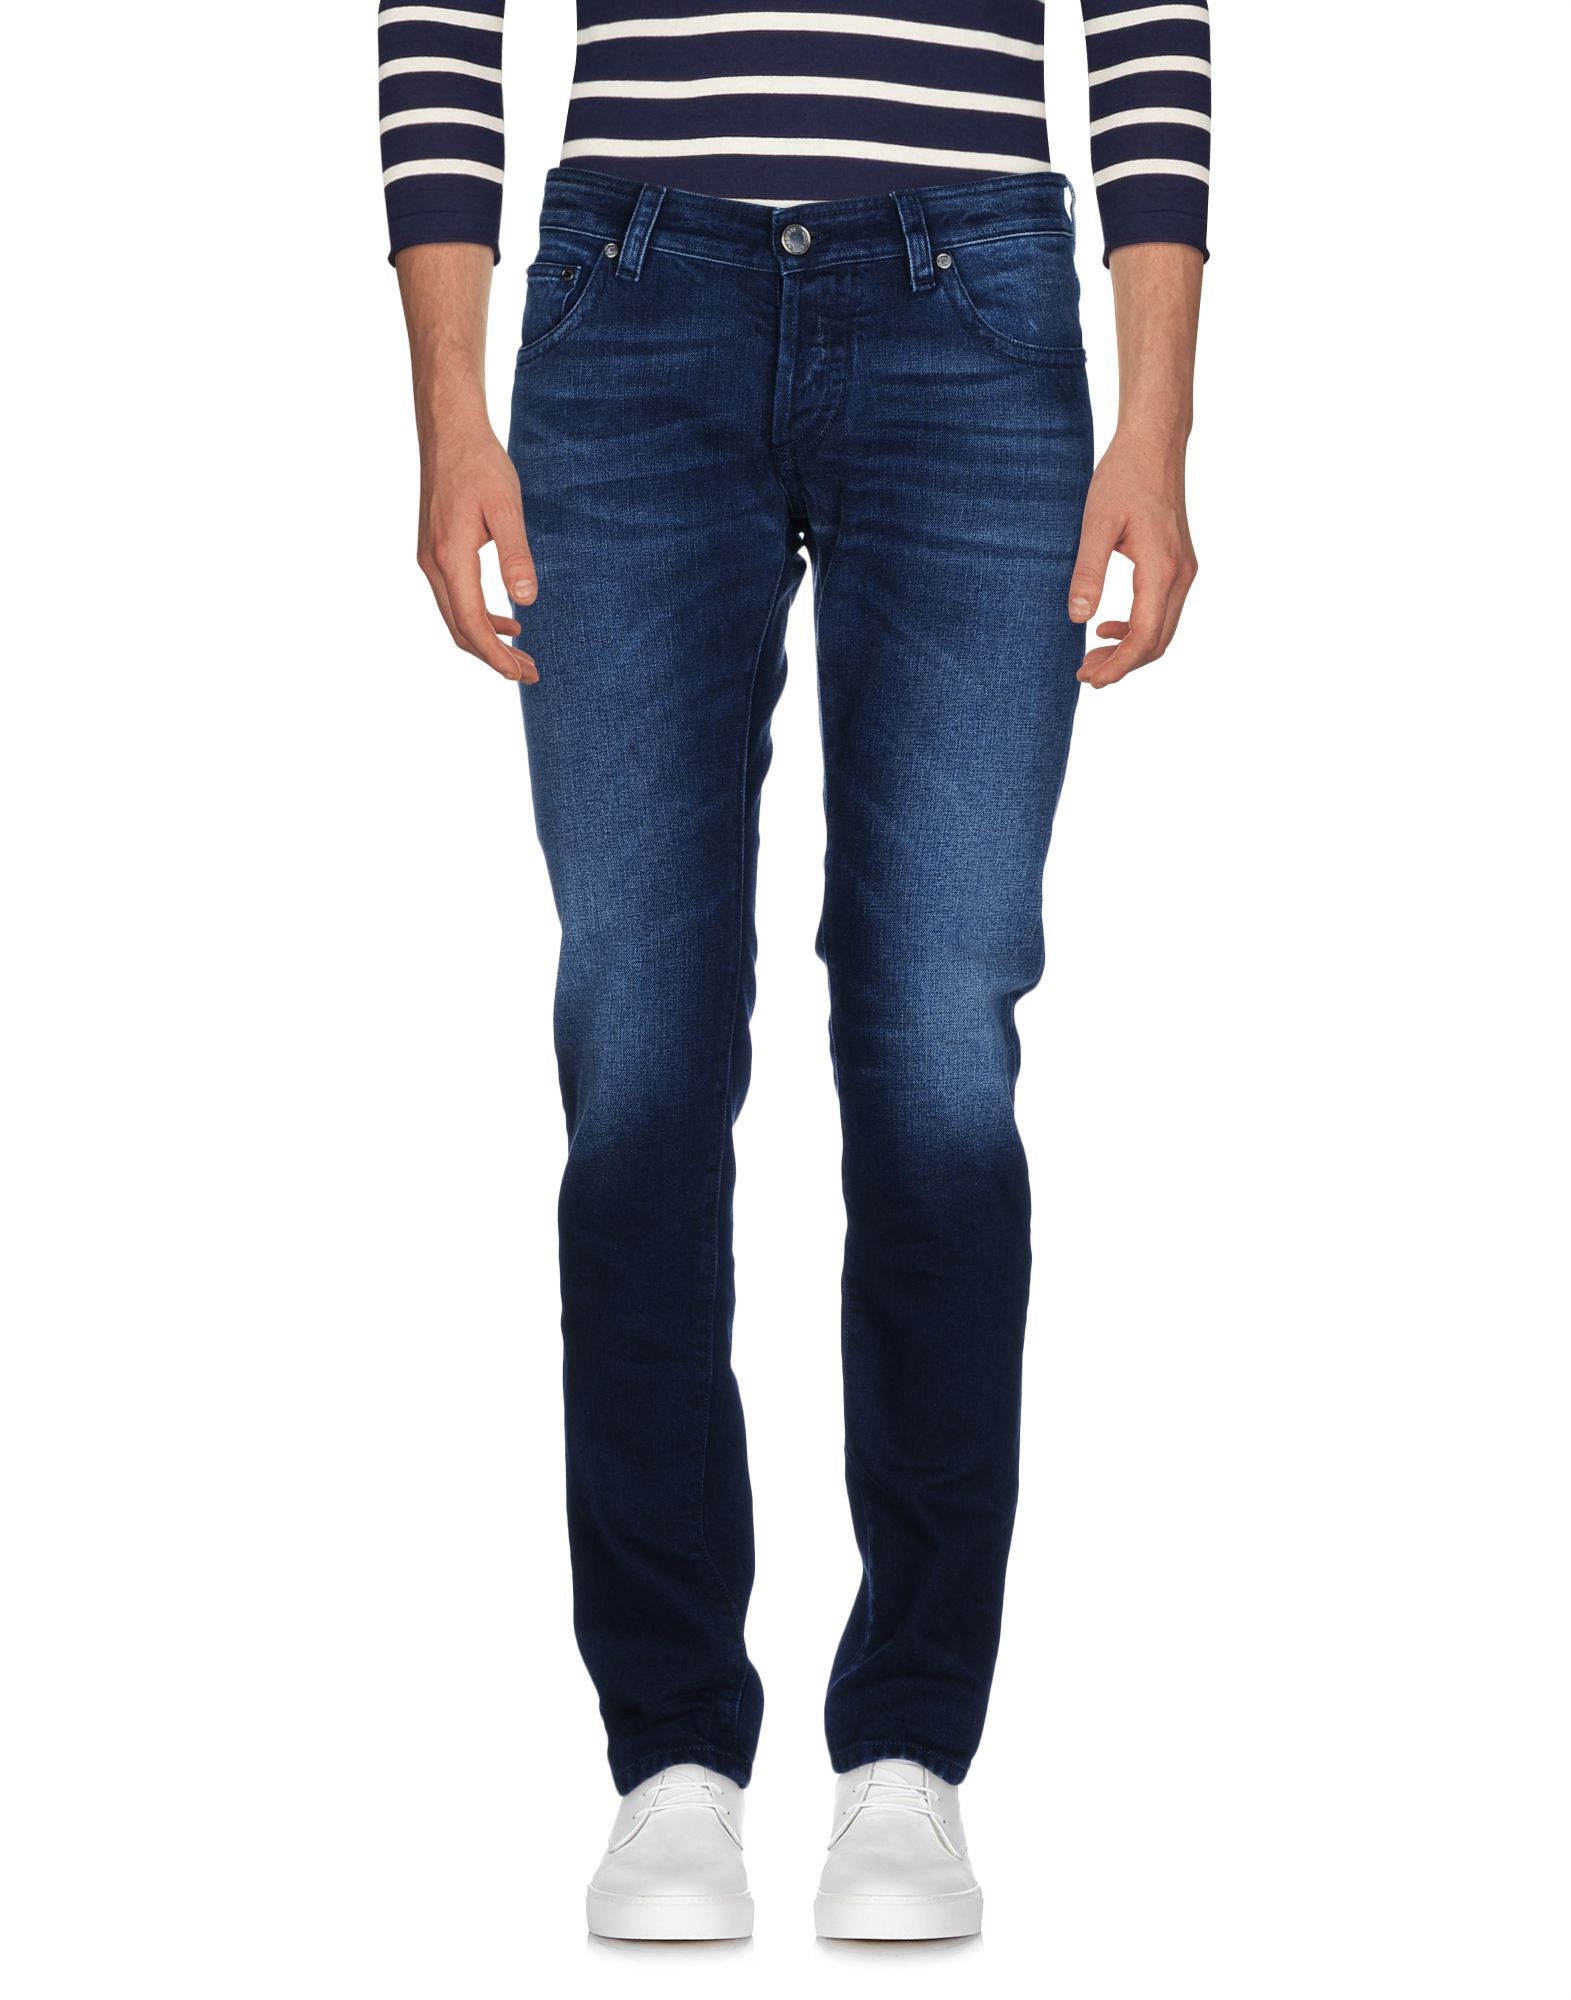 Pantaloni Moorer Jeans Moorer Pantaloni Uomo - 42626284VU 6432d8